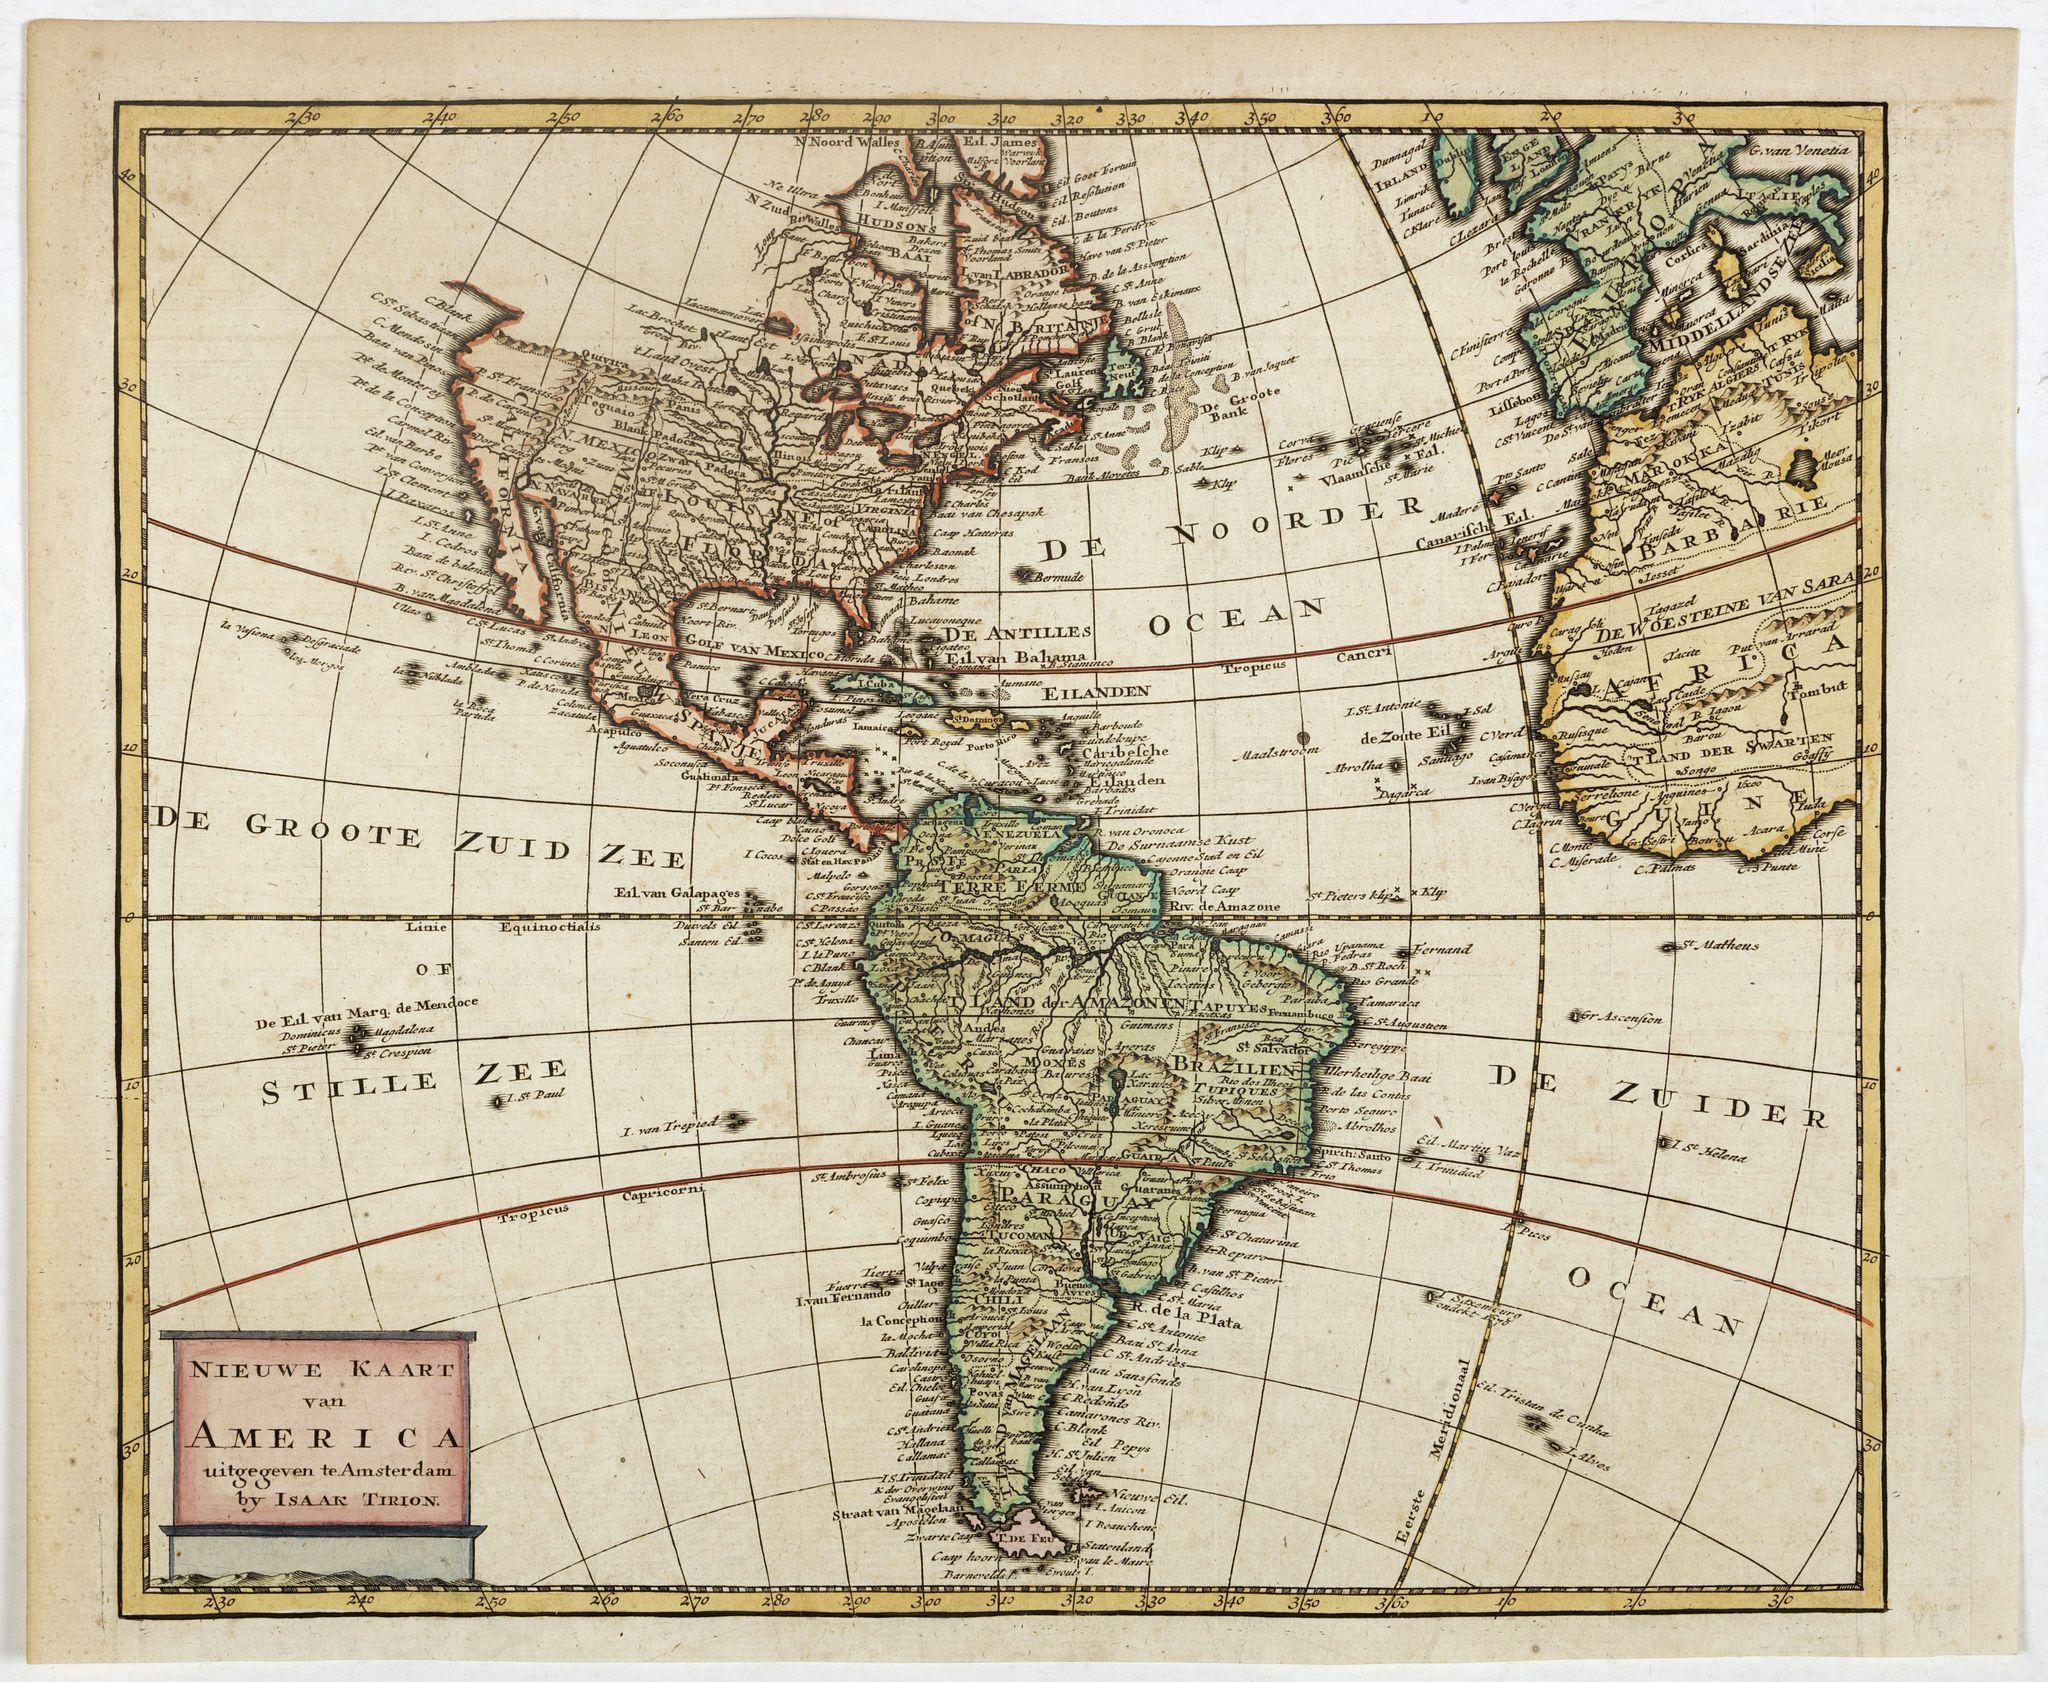 TIRION, I. -  Nieuwe kaart van America.